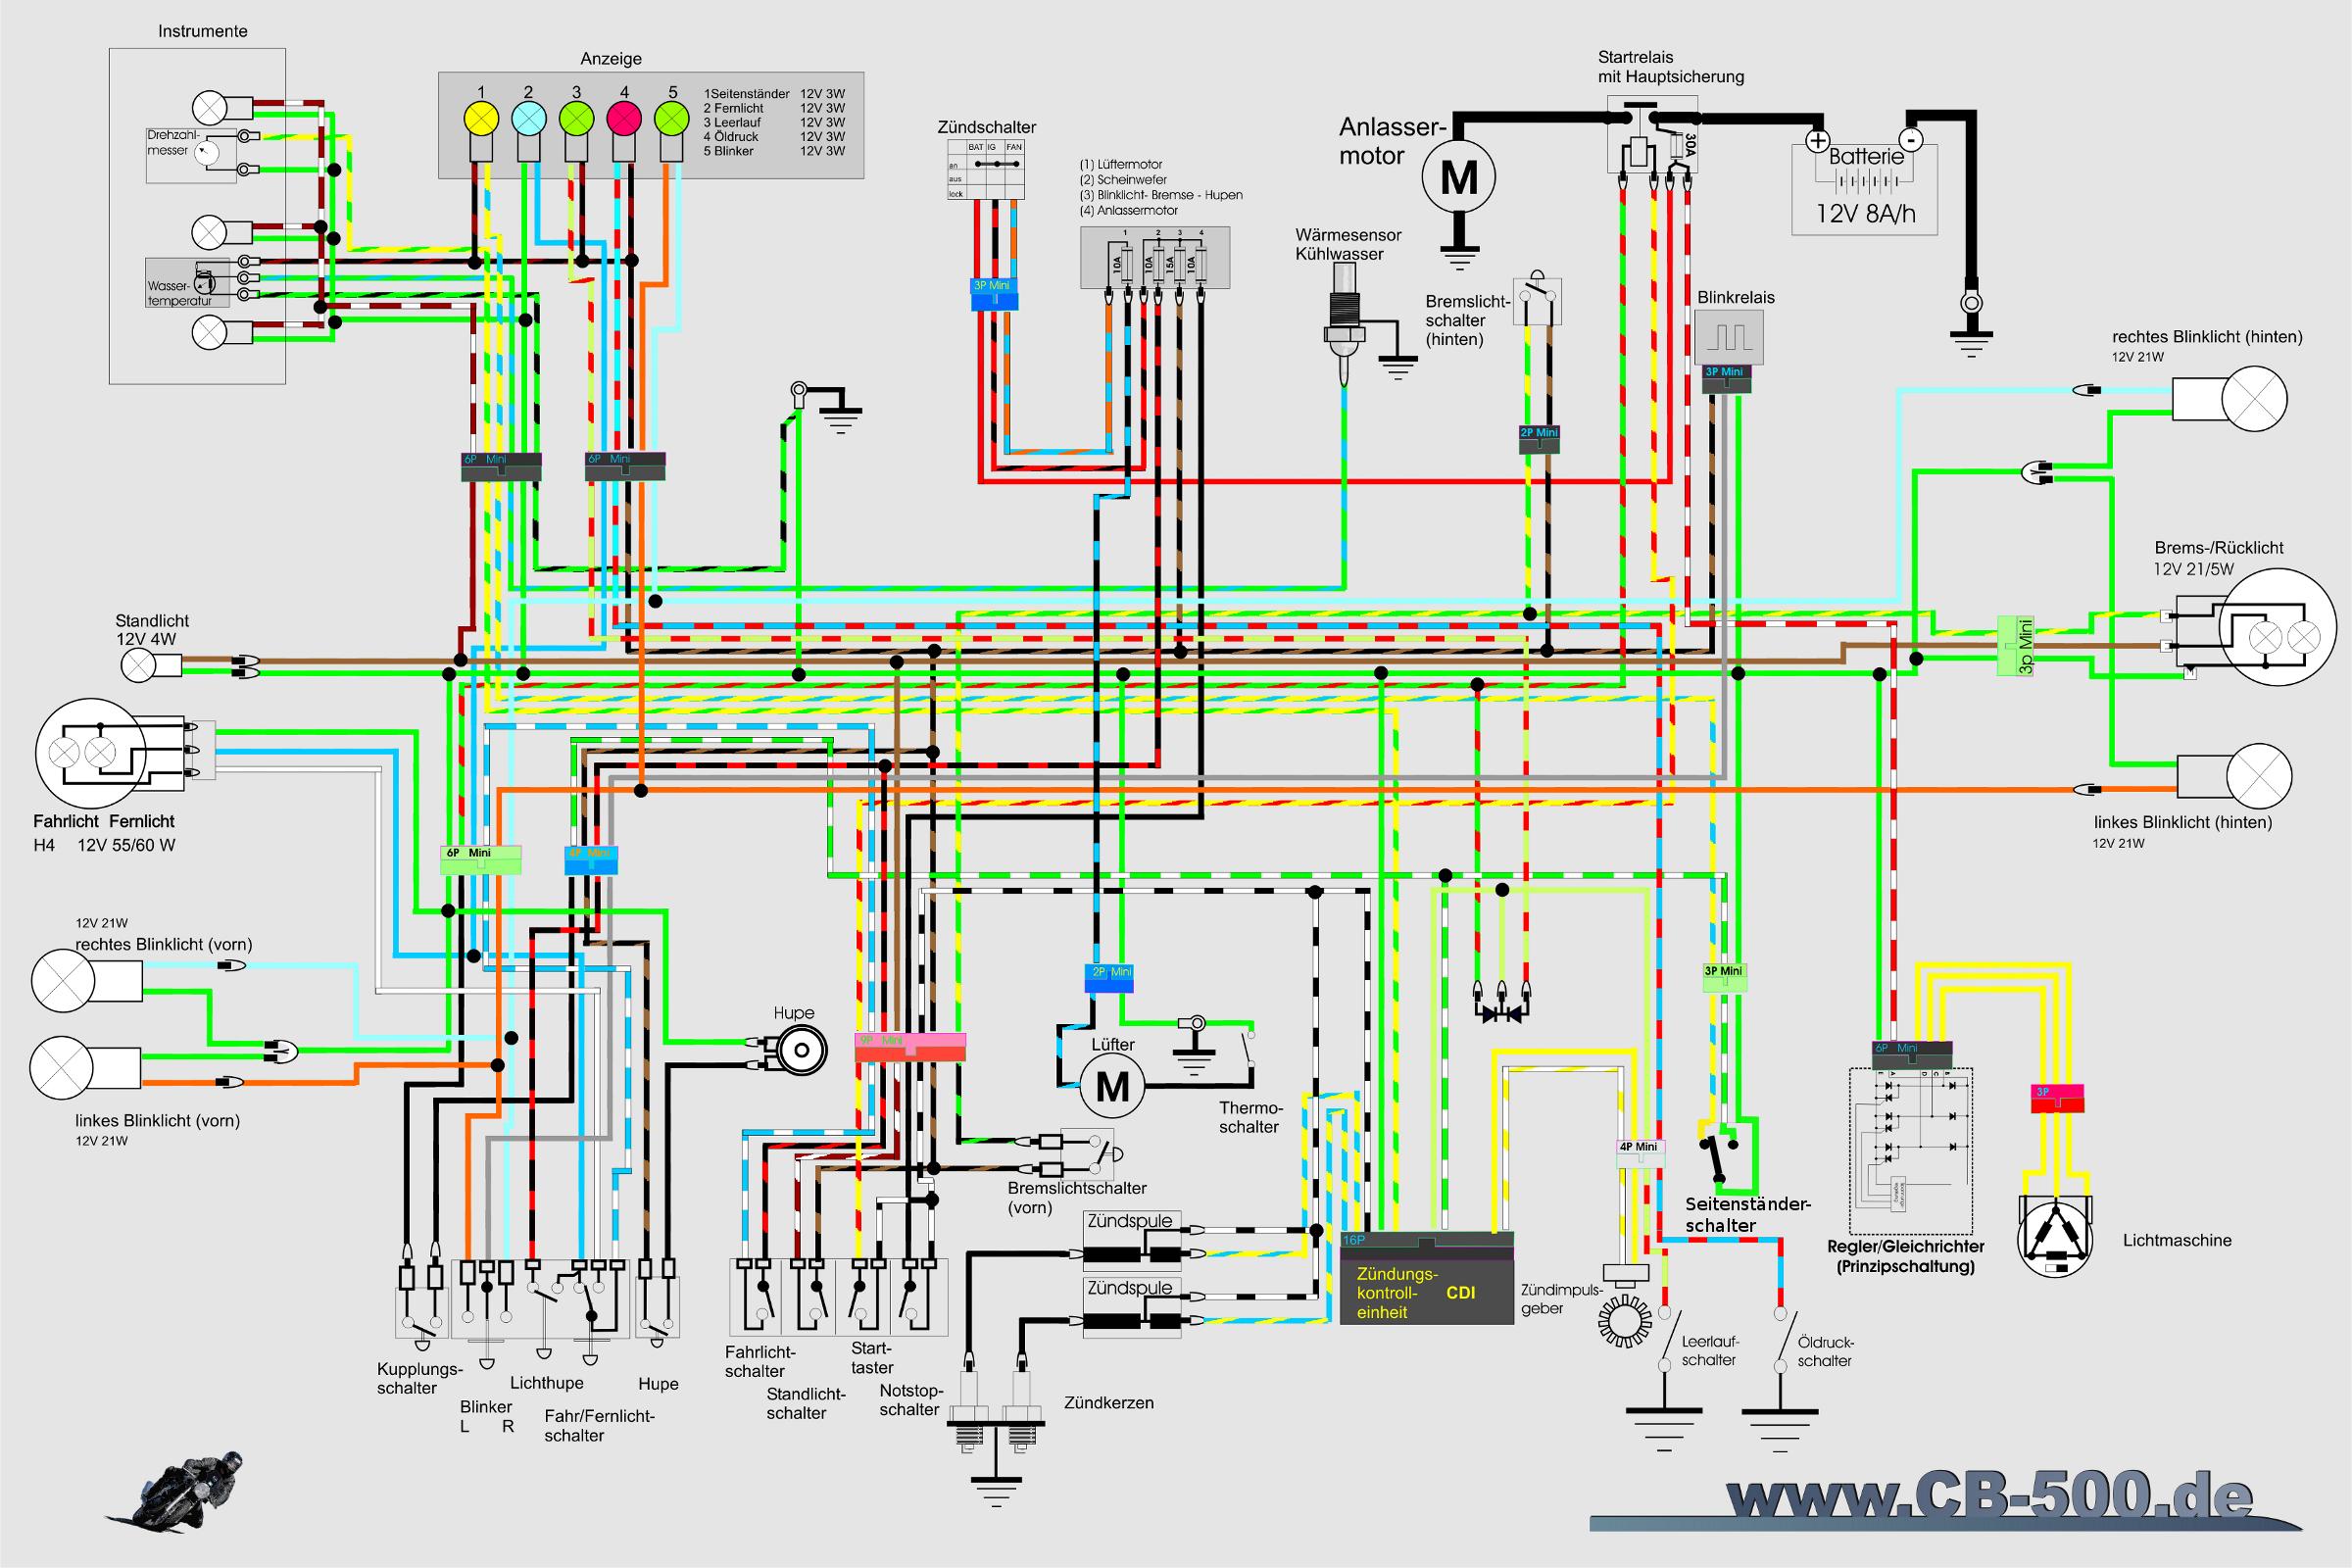 Schaltplan [HONDA CB 500 Wiki]